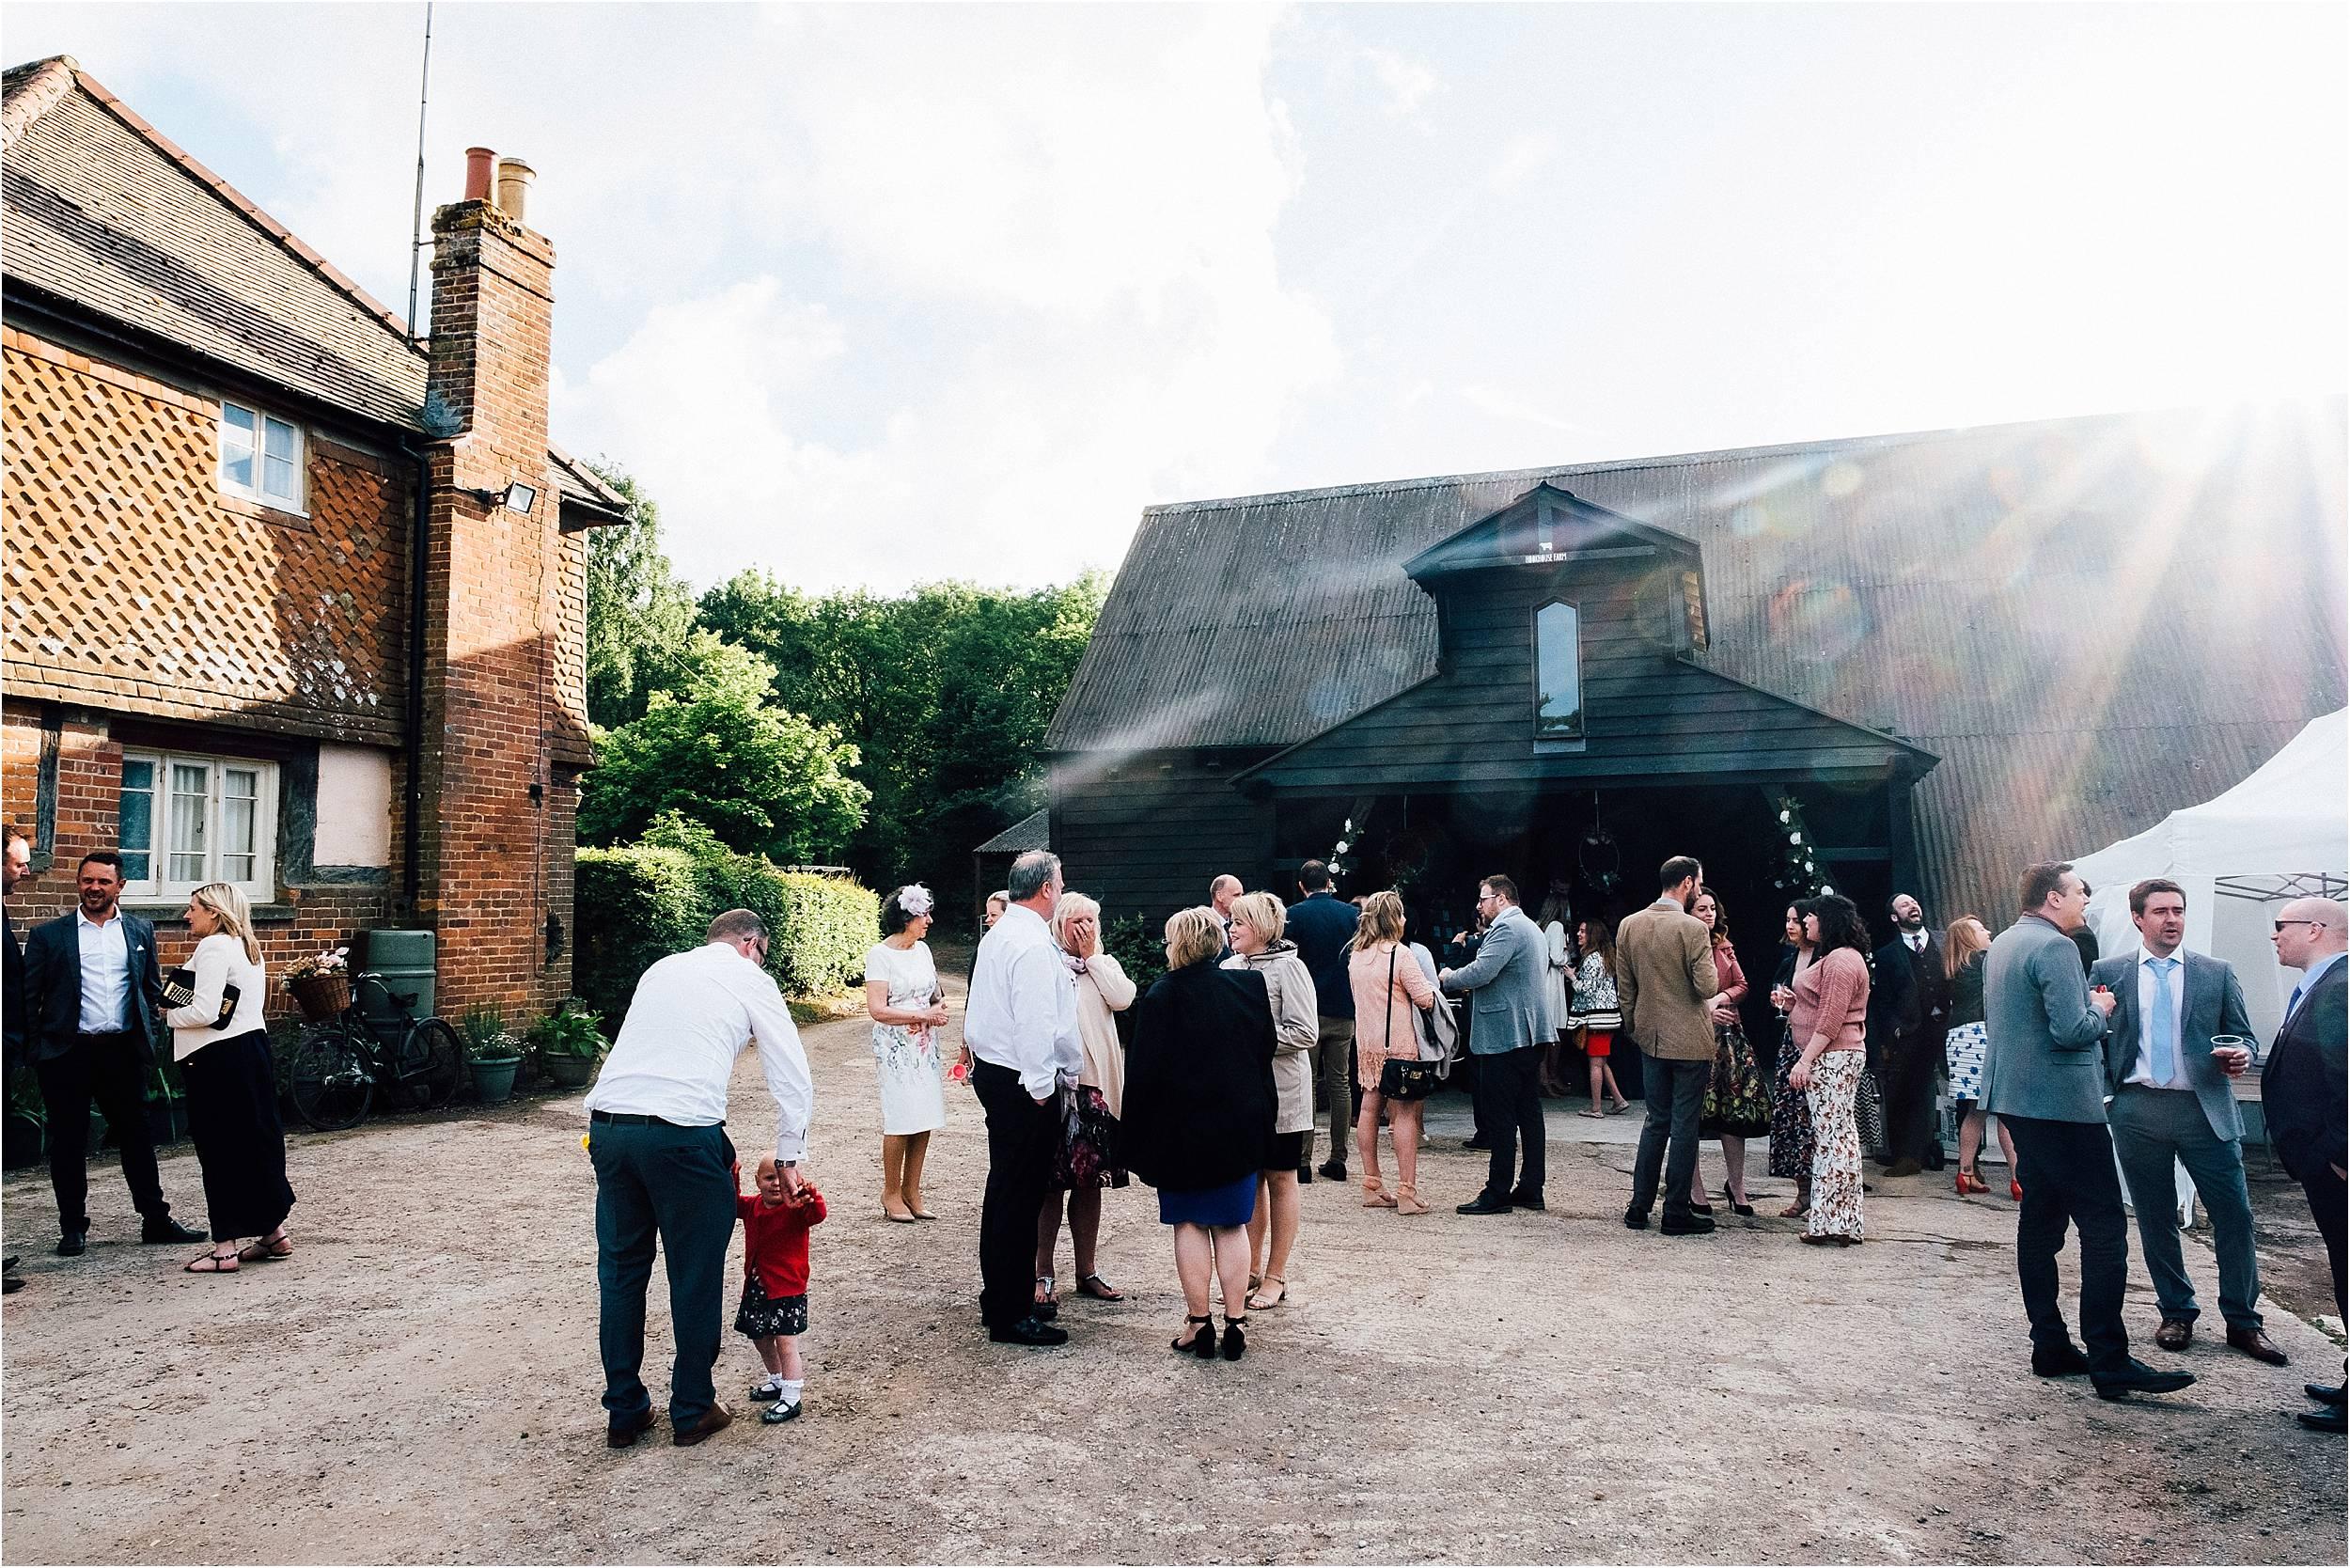 Surrey Hookhouse Farm Wedding Photographer_0170.jpg